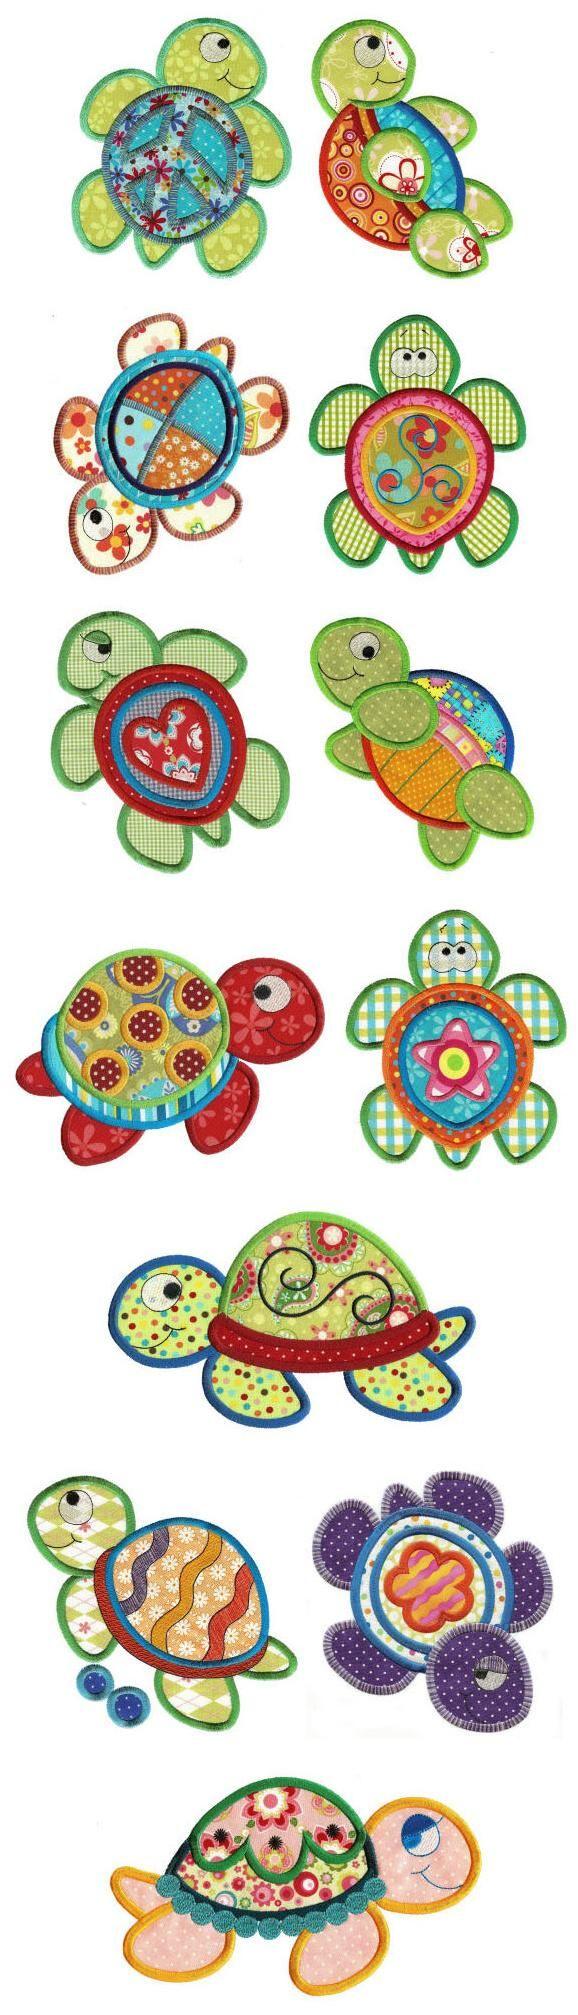 Sea Turtles Applique - Designs By JuJu | OregonPatchWorks